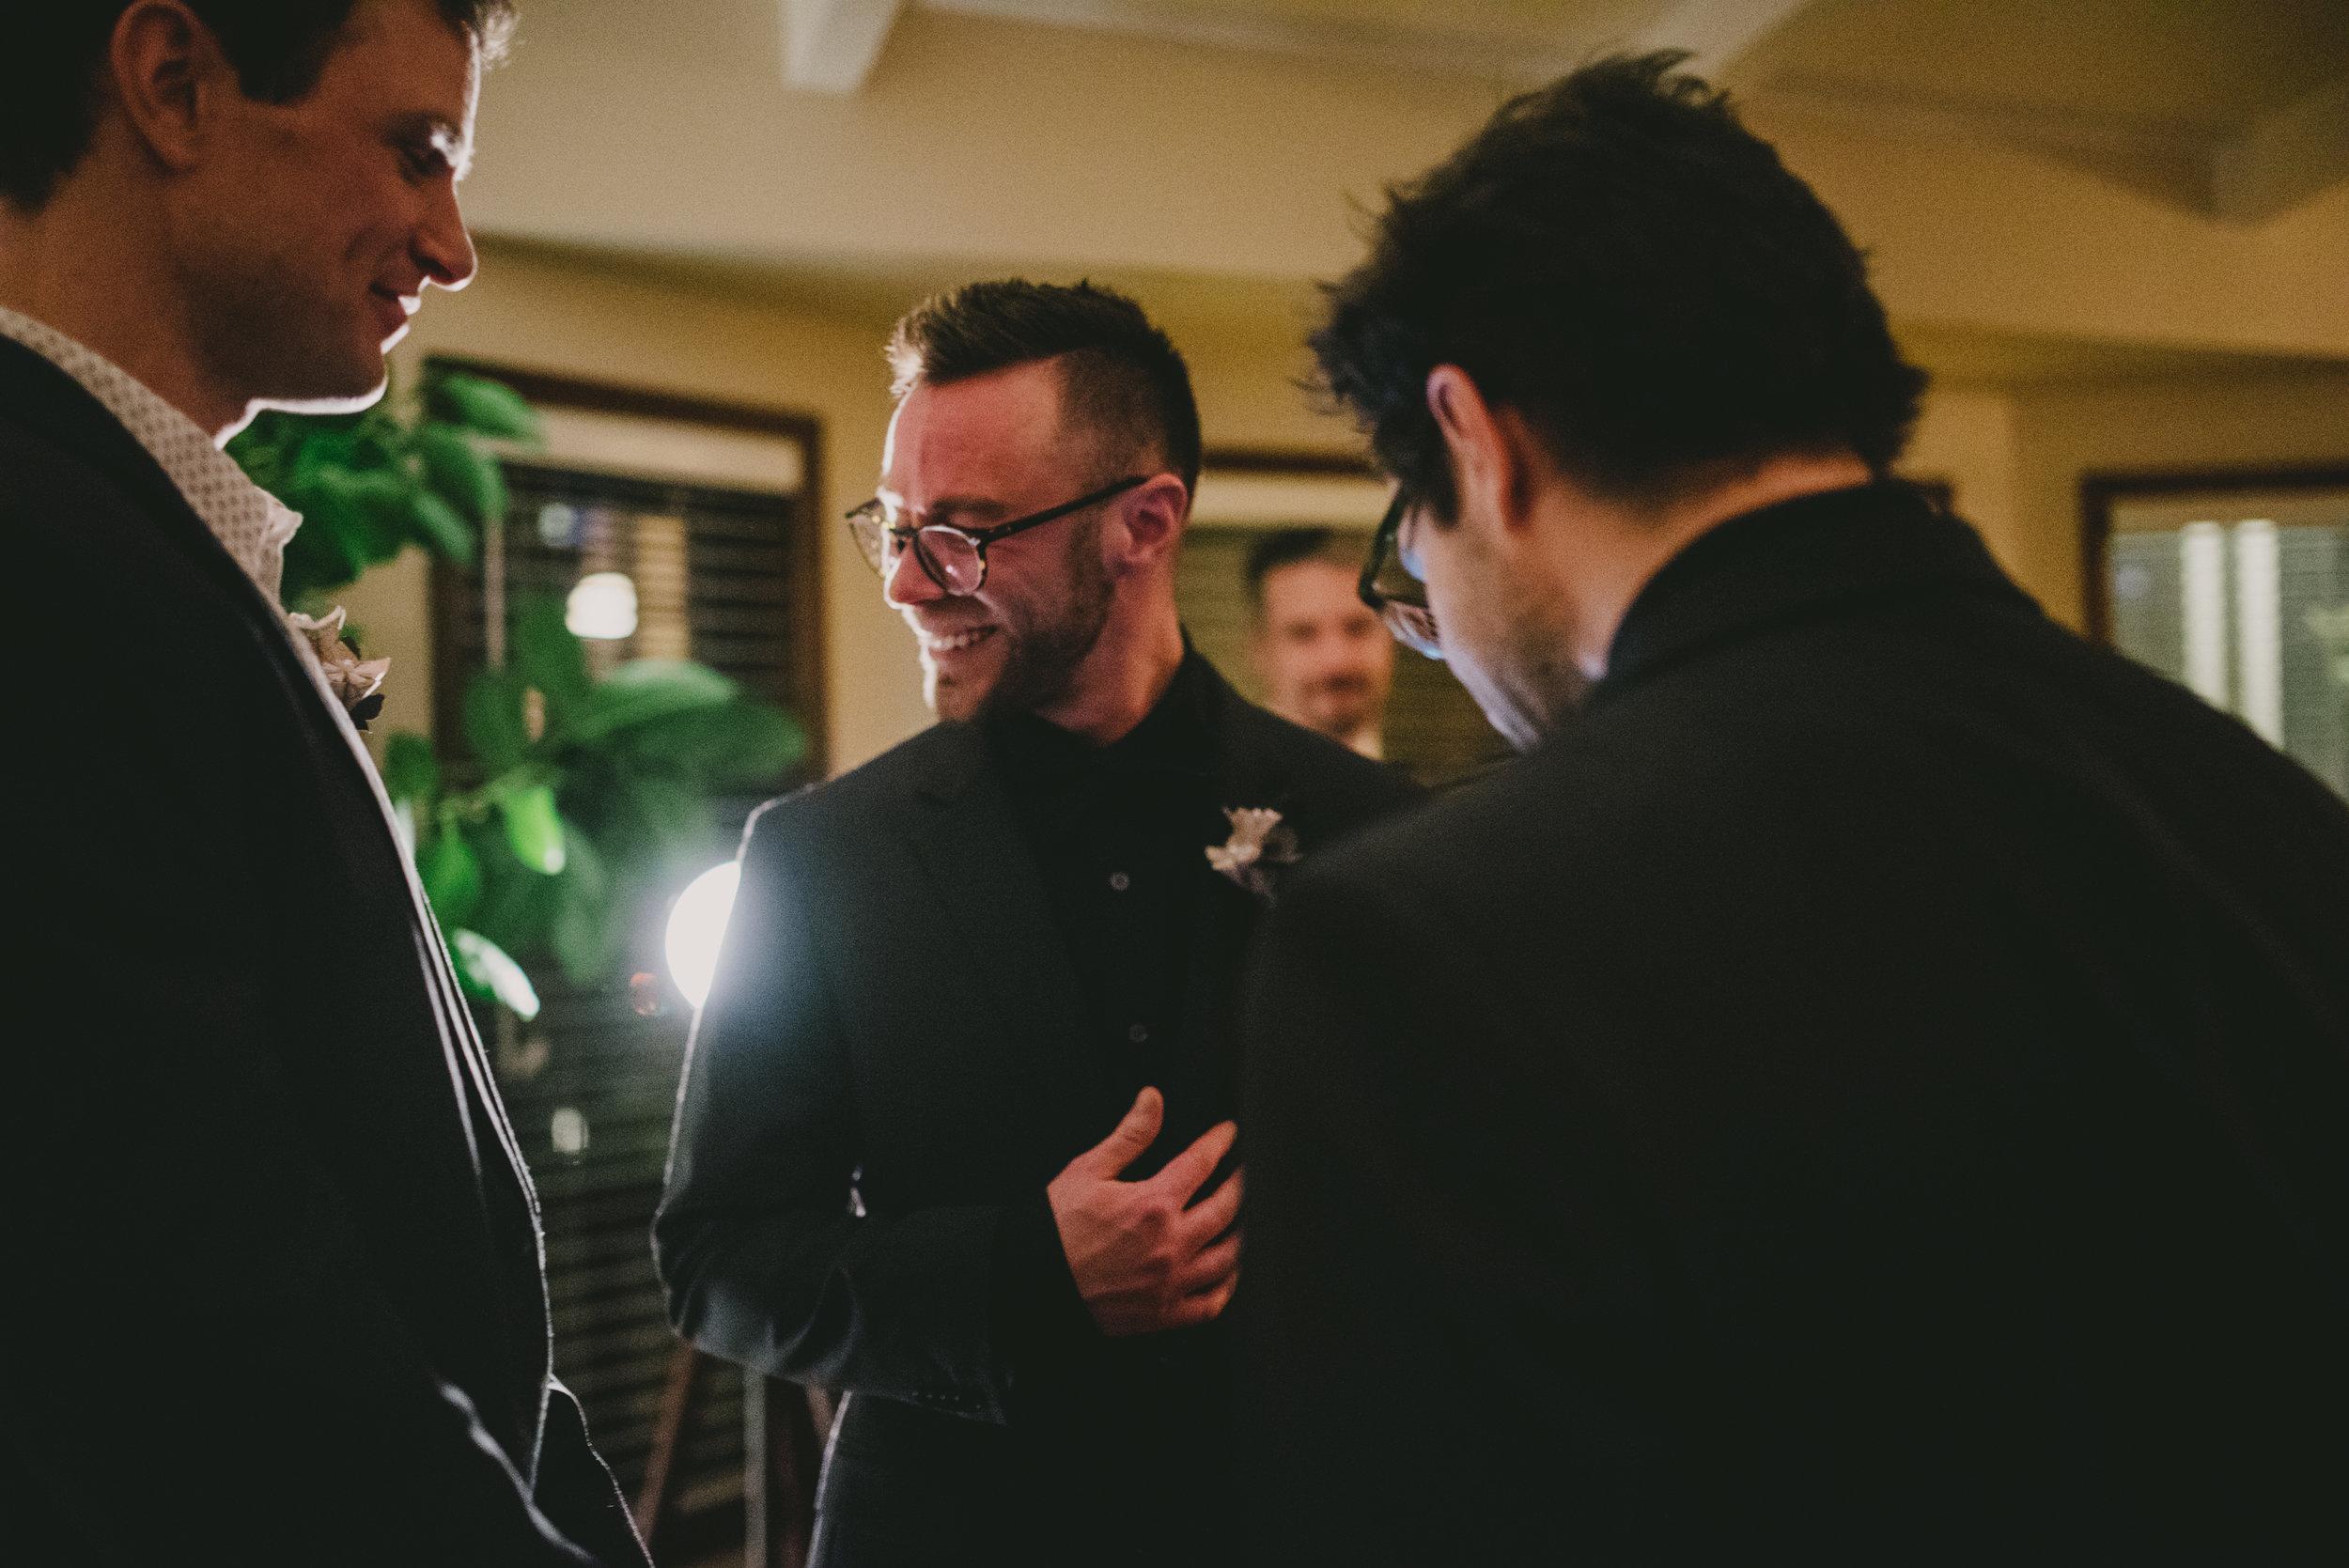 intimate-same-sex-wedding-ceremony-photo.jpg